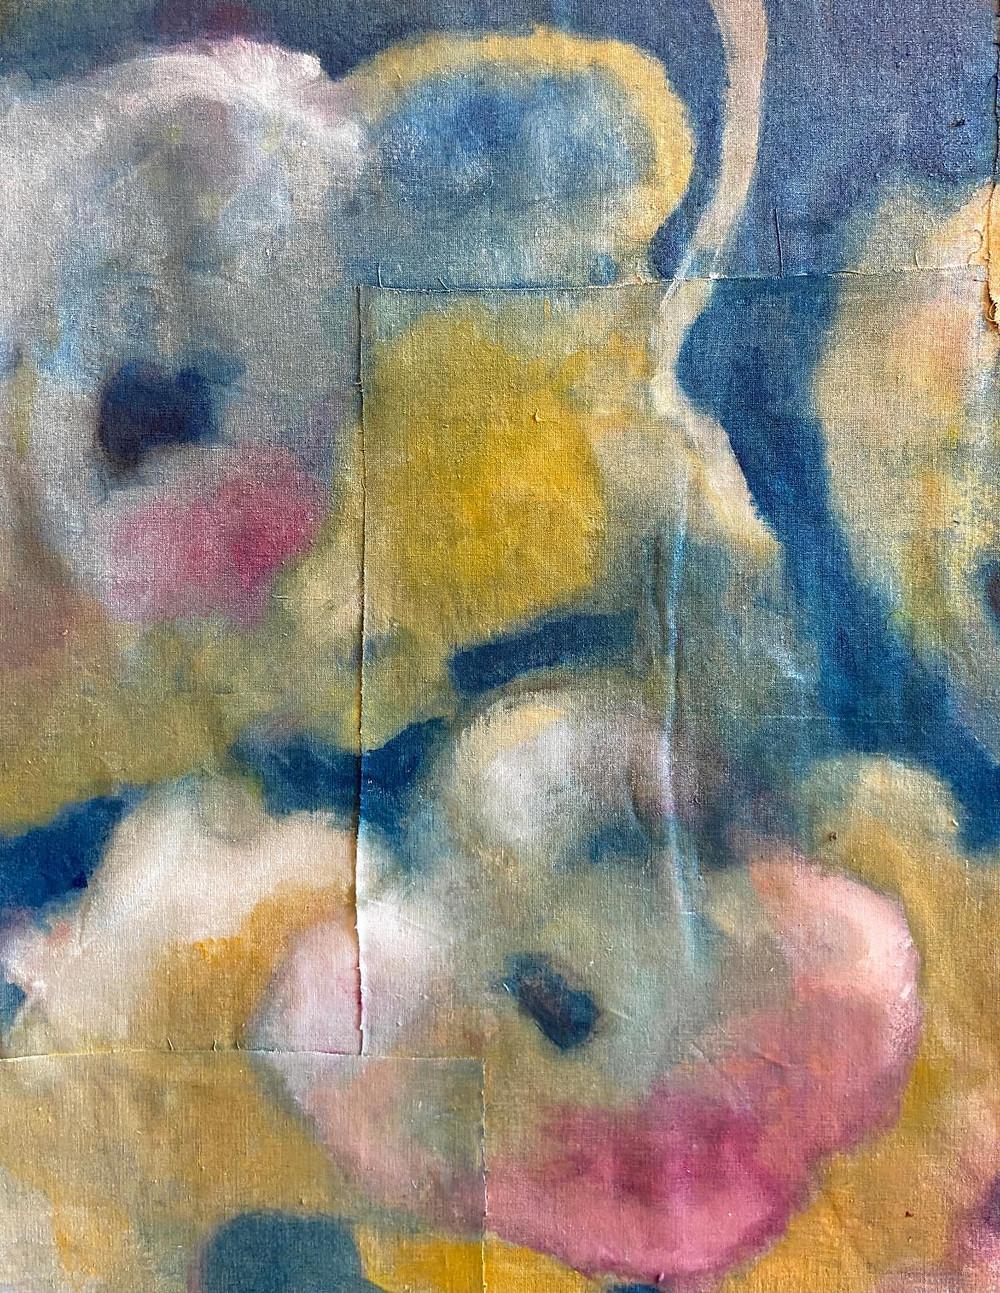 Elisa Carutti, Chrysalis #01, 105 x 90 cm, 2020